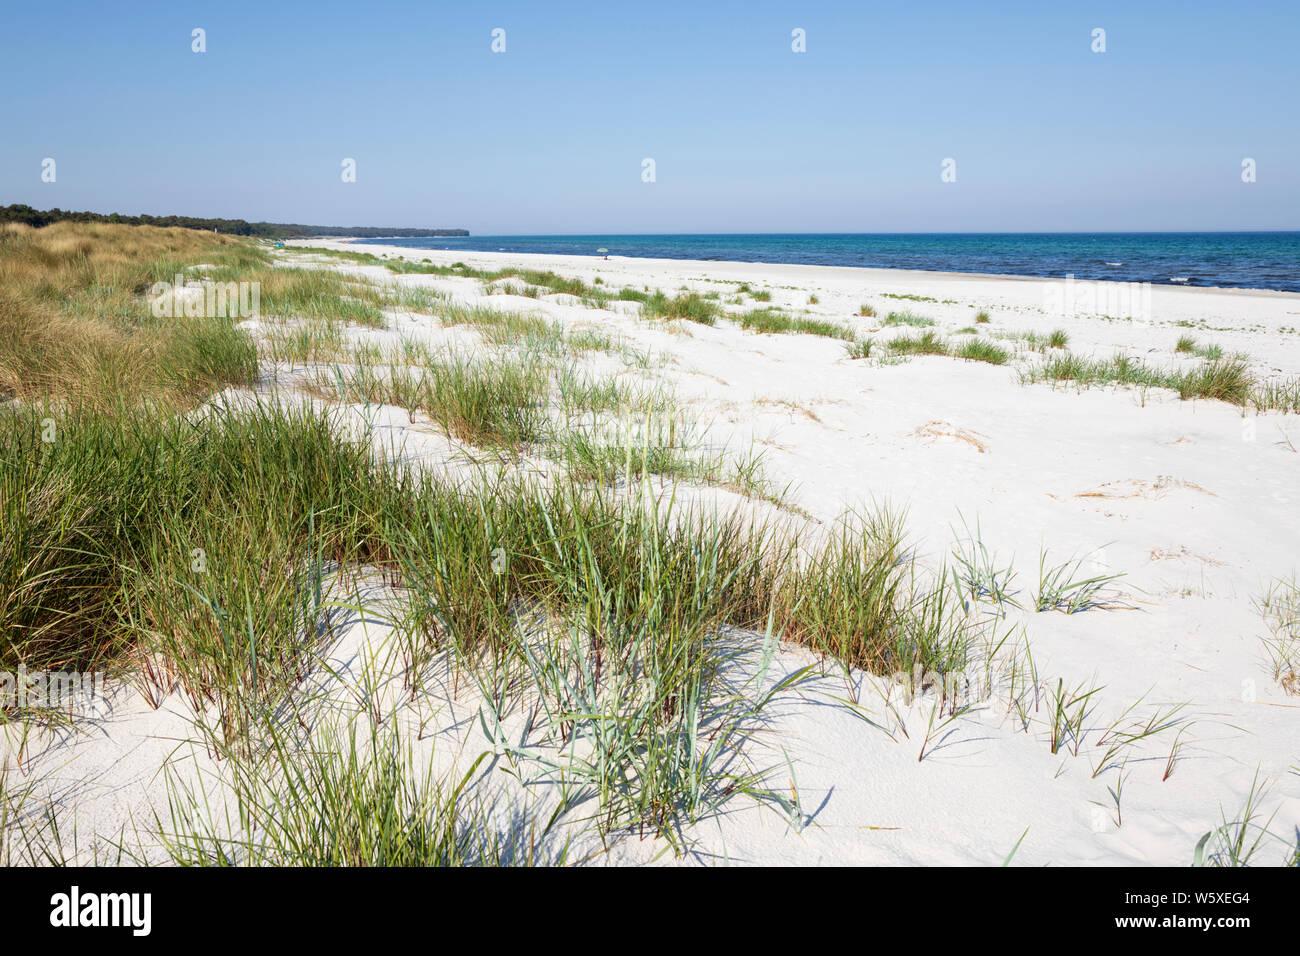 Playa de arena blanca de Dueodde en la costa sur de la isla, Dueodde, la isla de Bornholm, Mar Báltico, Dinamarca, Europa Foto de stock